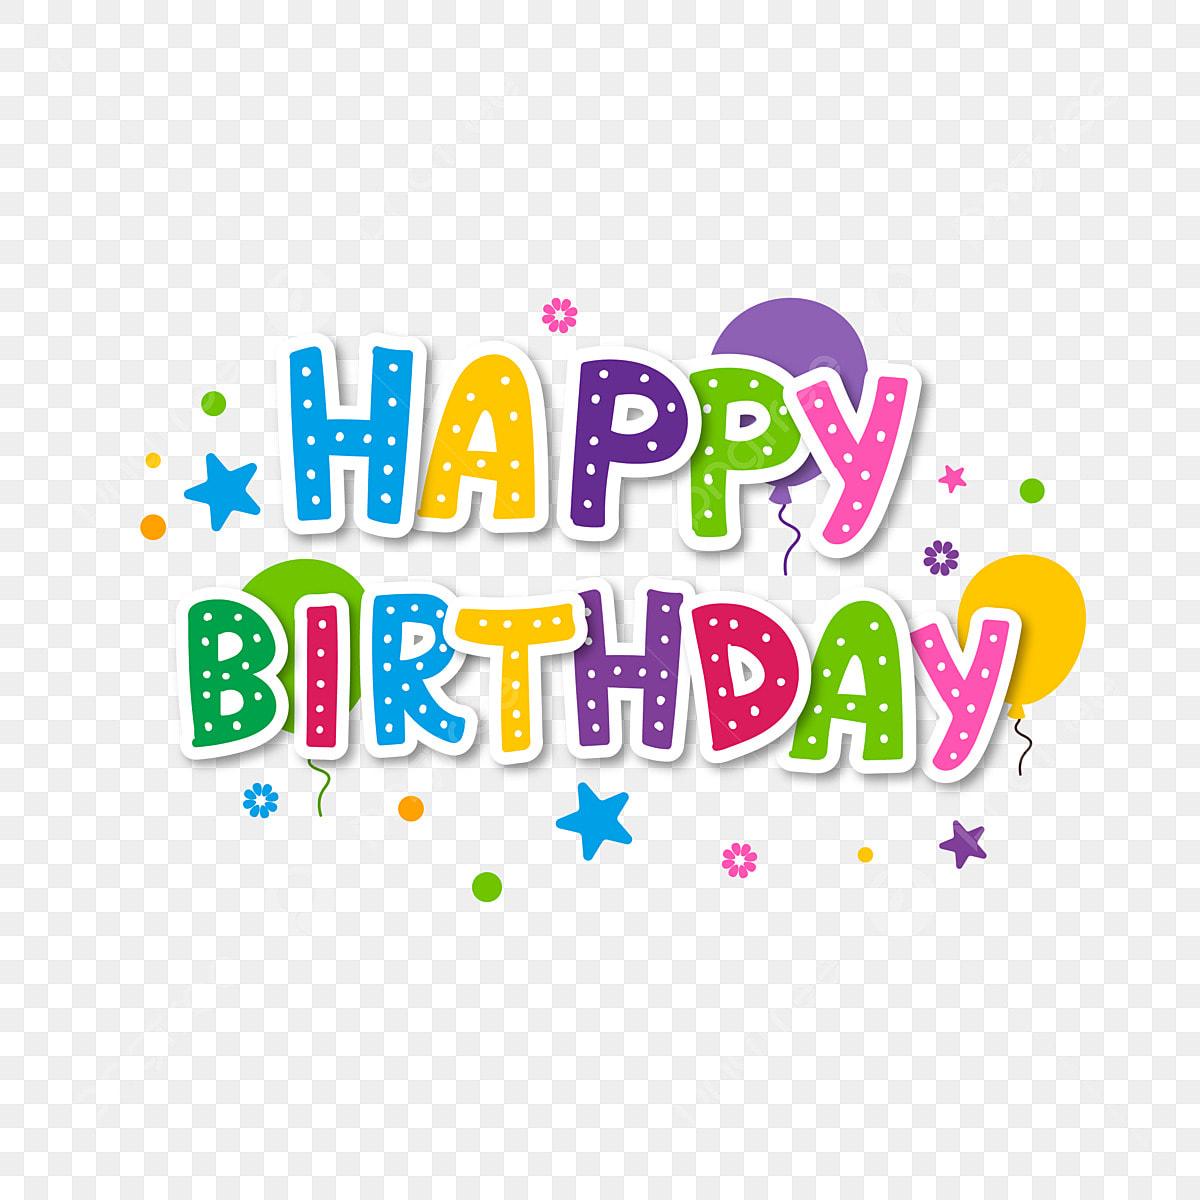 Happy Birthday Colorful Greeting Card Label, Birthday, Happy, Card